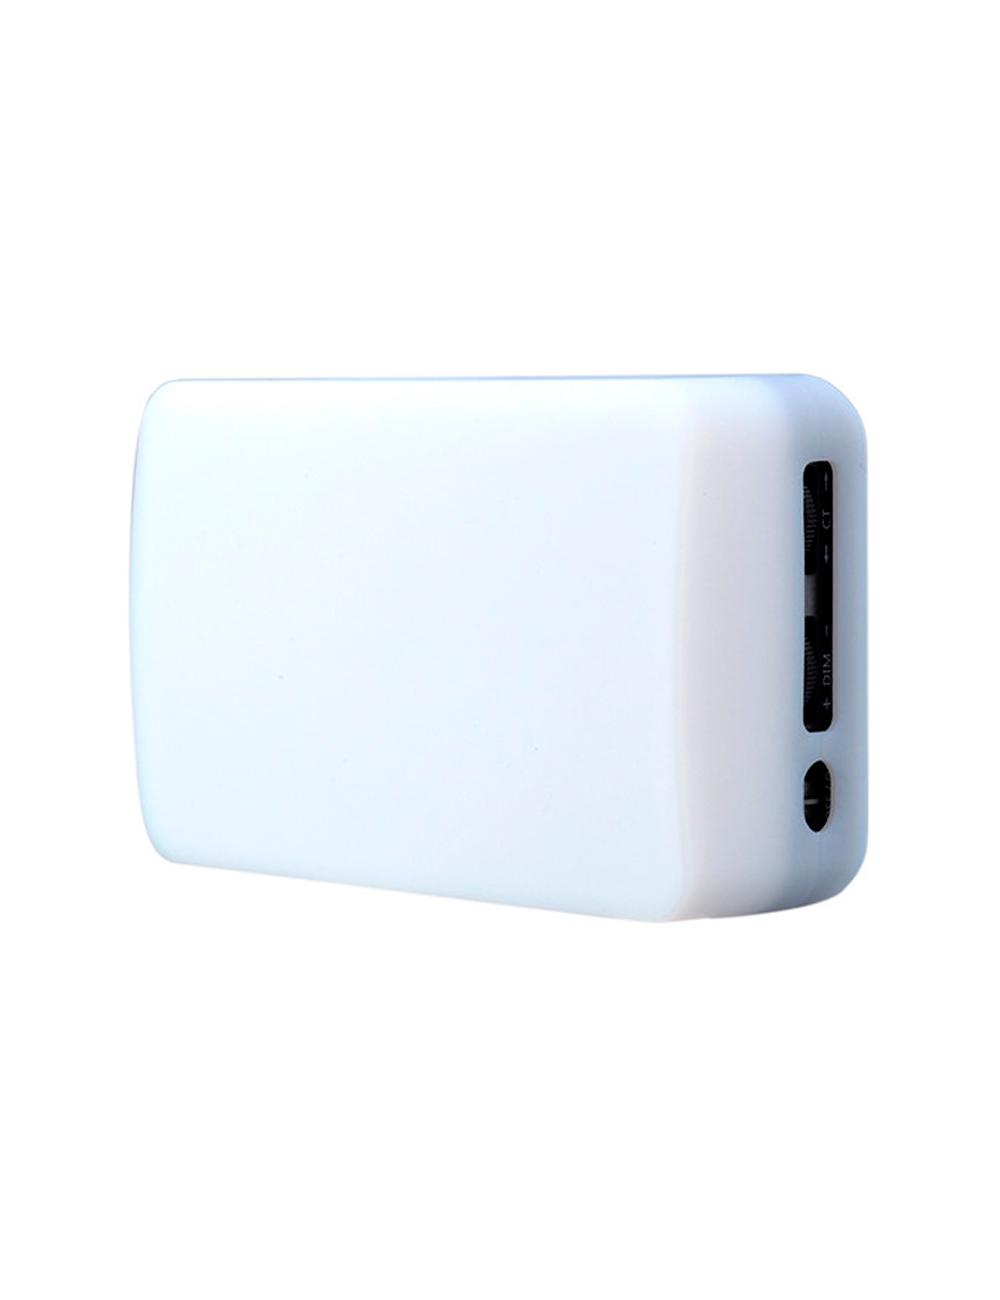 Monopie portable y compacto Nest NT-129A